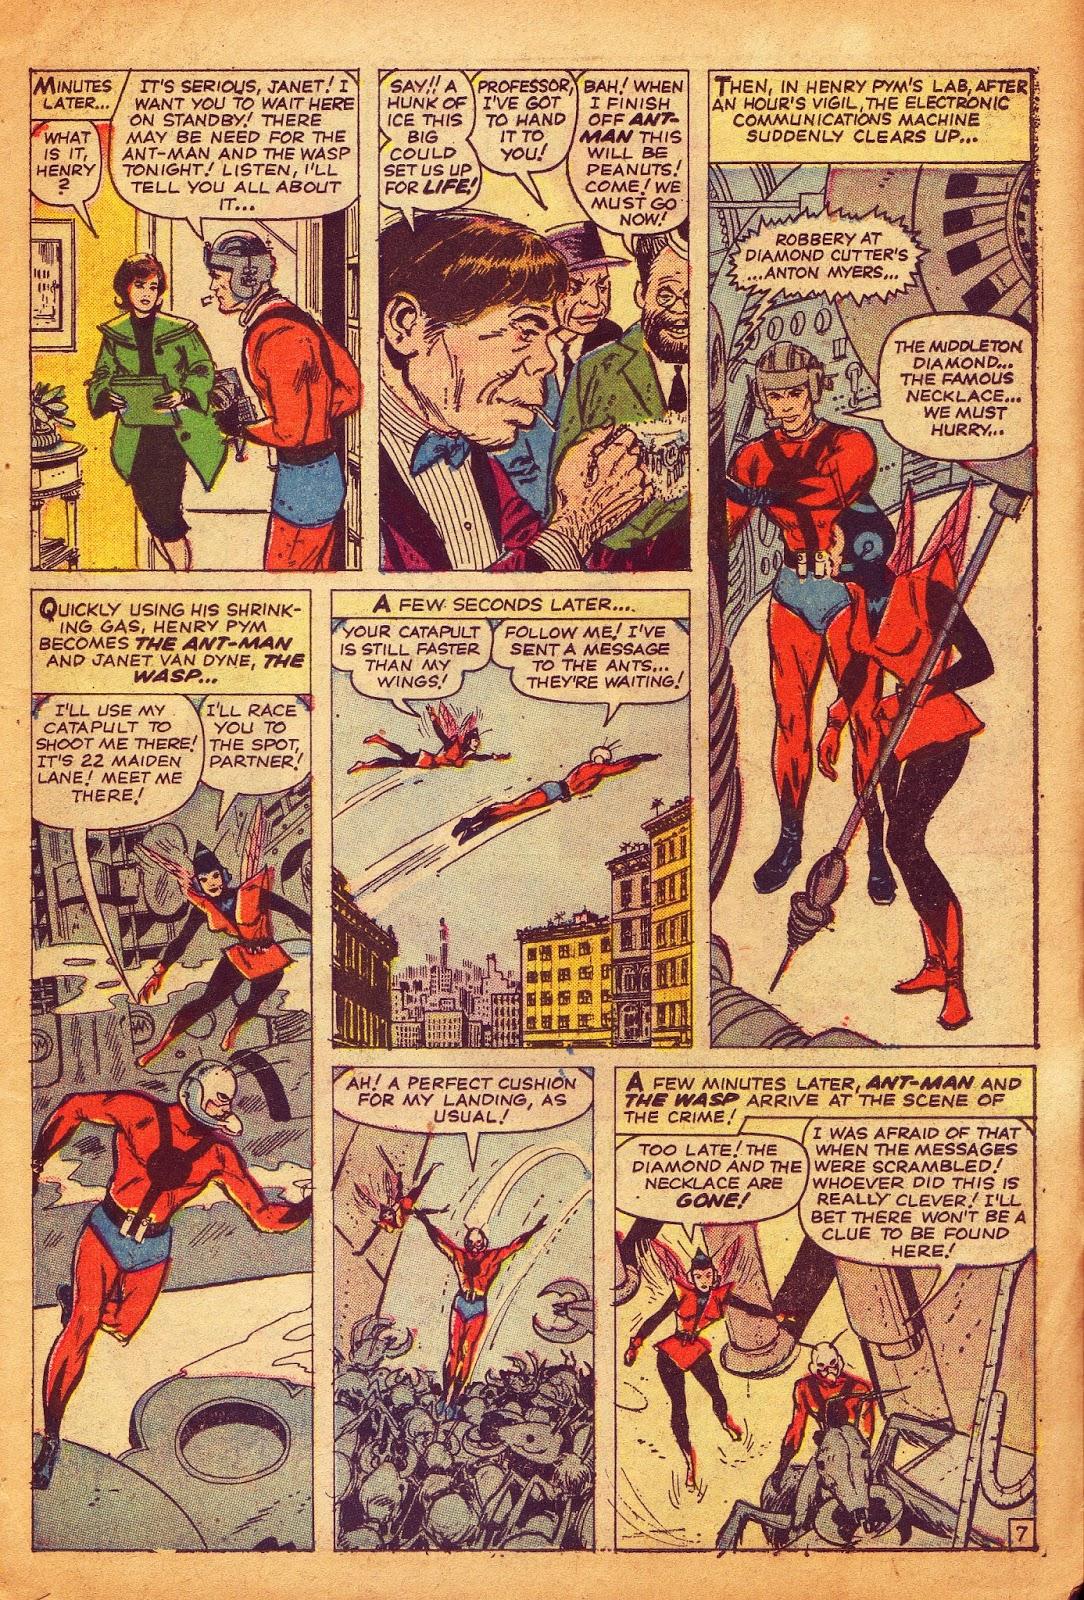 Stan Lee plot, Ernie Hart script, Don Heck art, Artie Simek letters, Stan  Goldberg colors, Tales to Astonish # 45, July 1963.